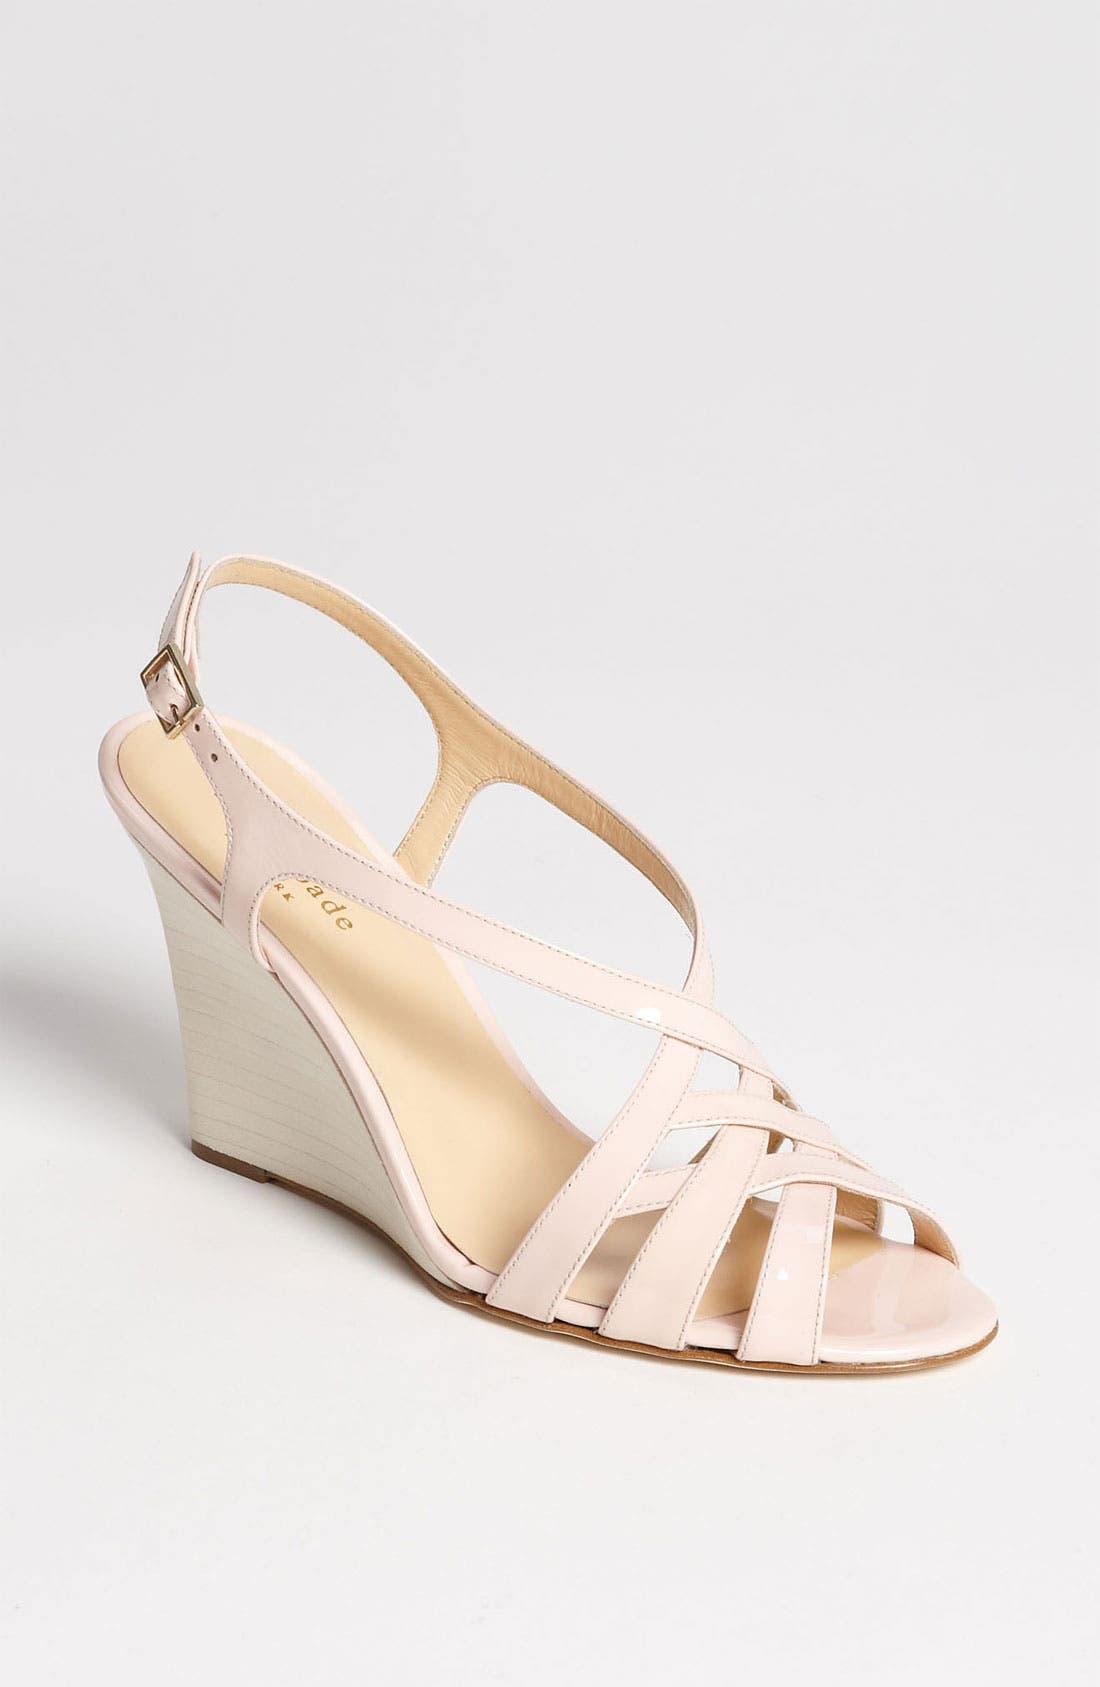 Main Image - kate spade new york 'illie' wedge sandal